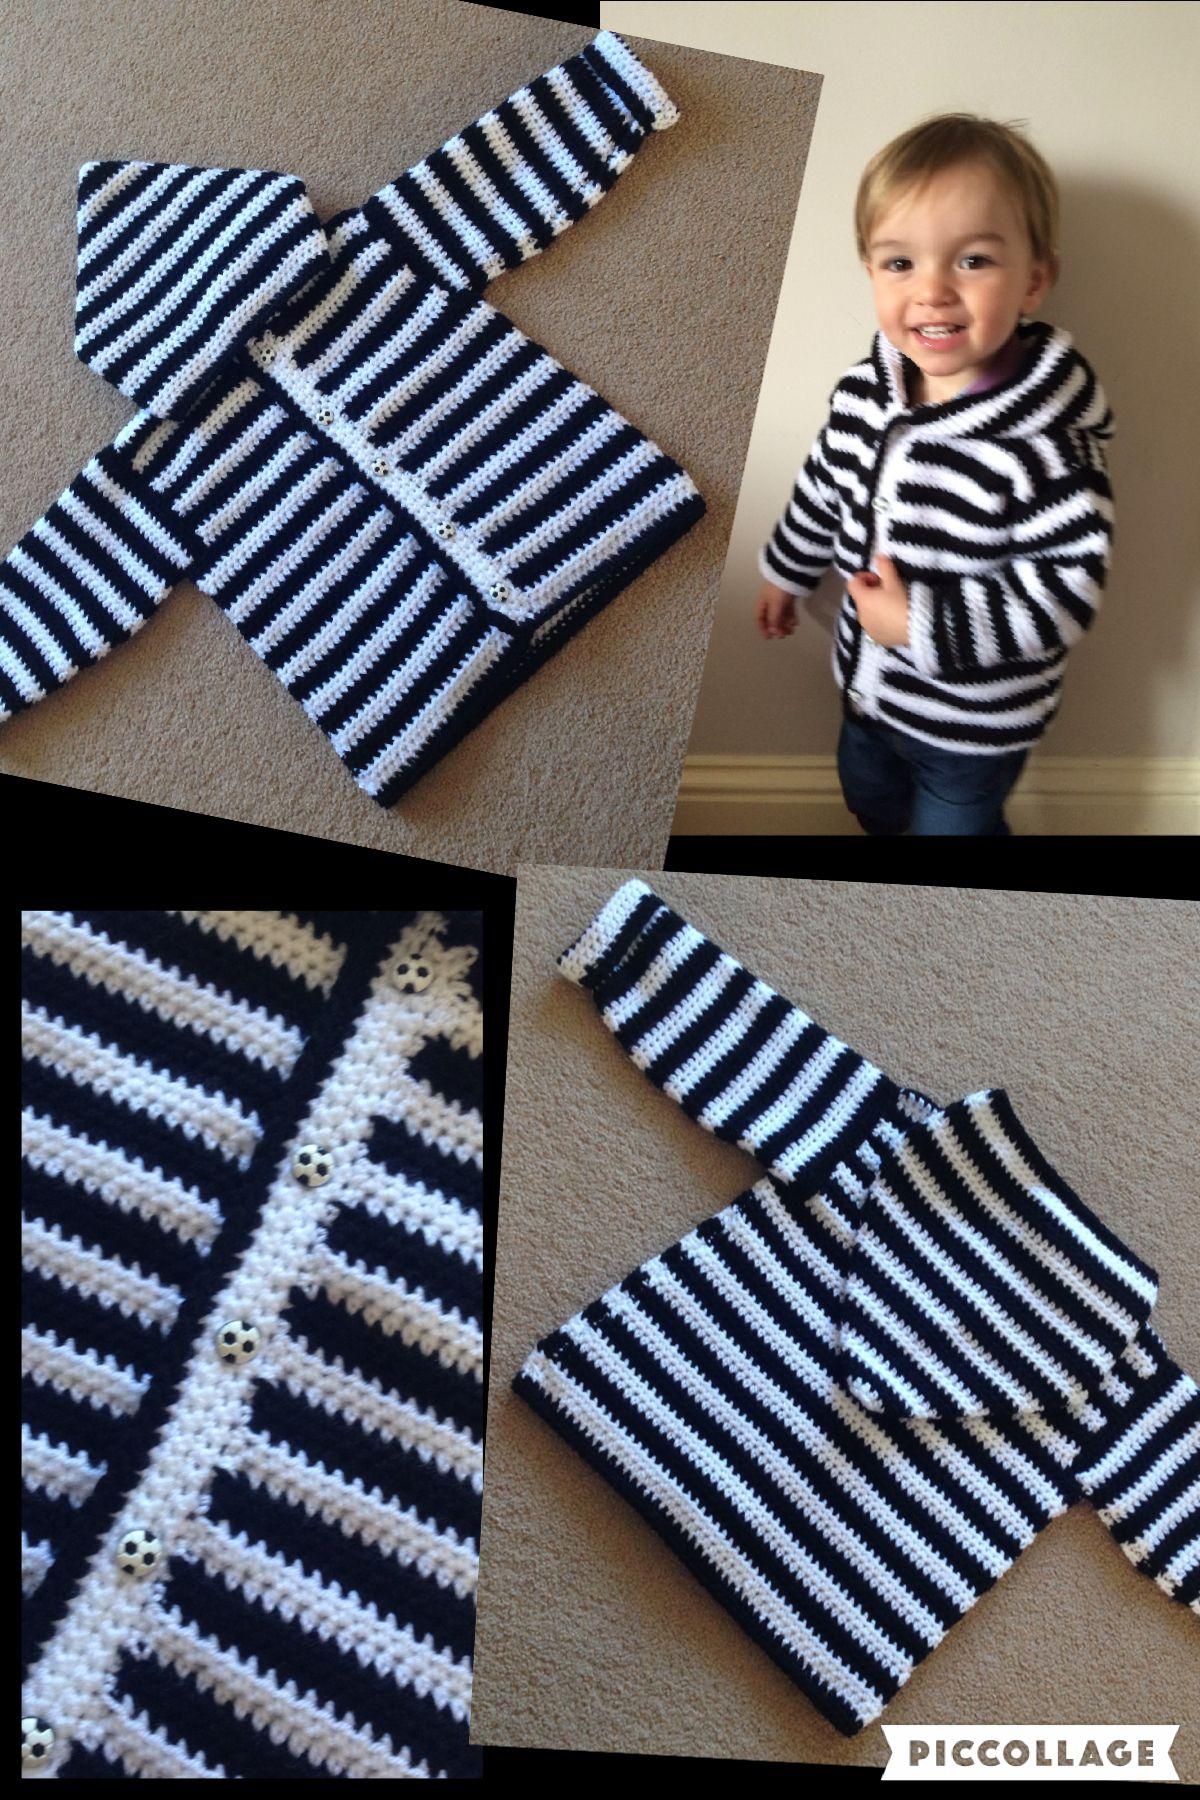 Casaca de nio pinteres crochet for children sweet baby hoodie free pattern bankloansurffo Choice Image